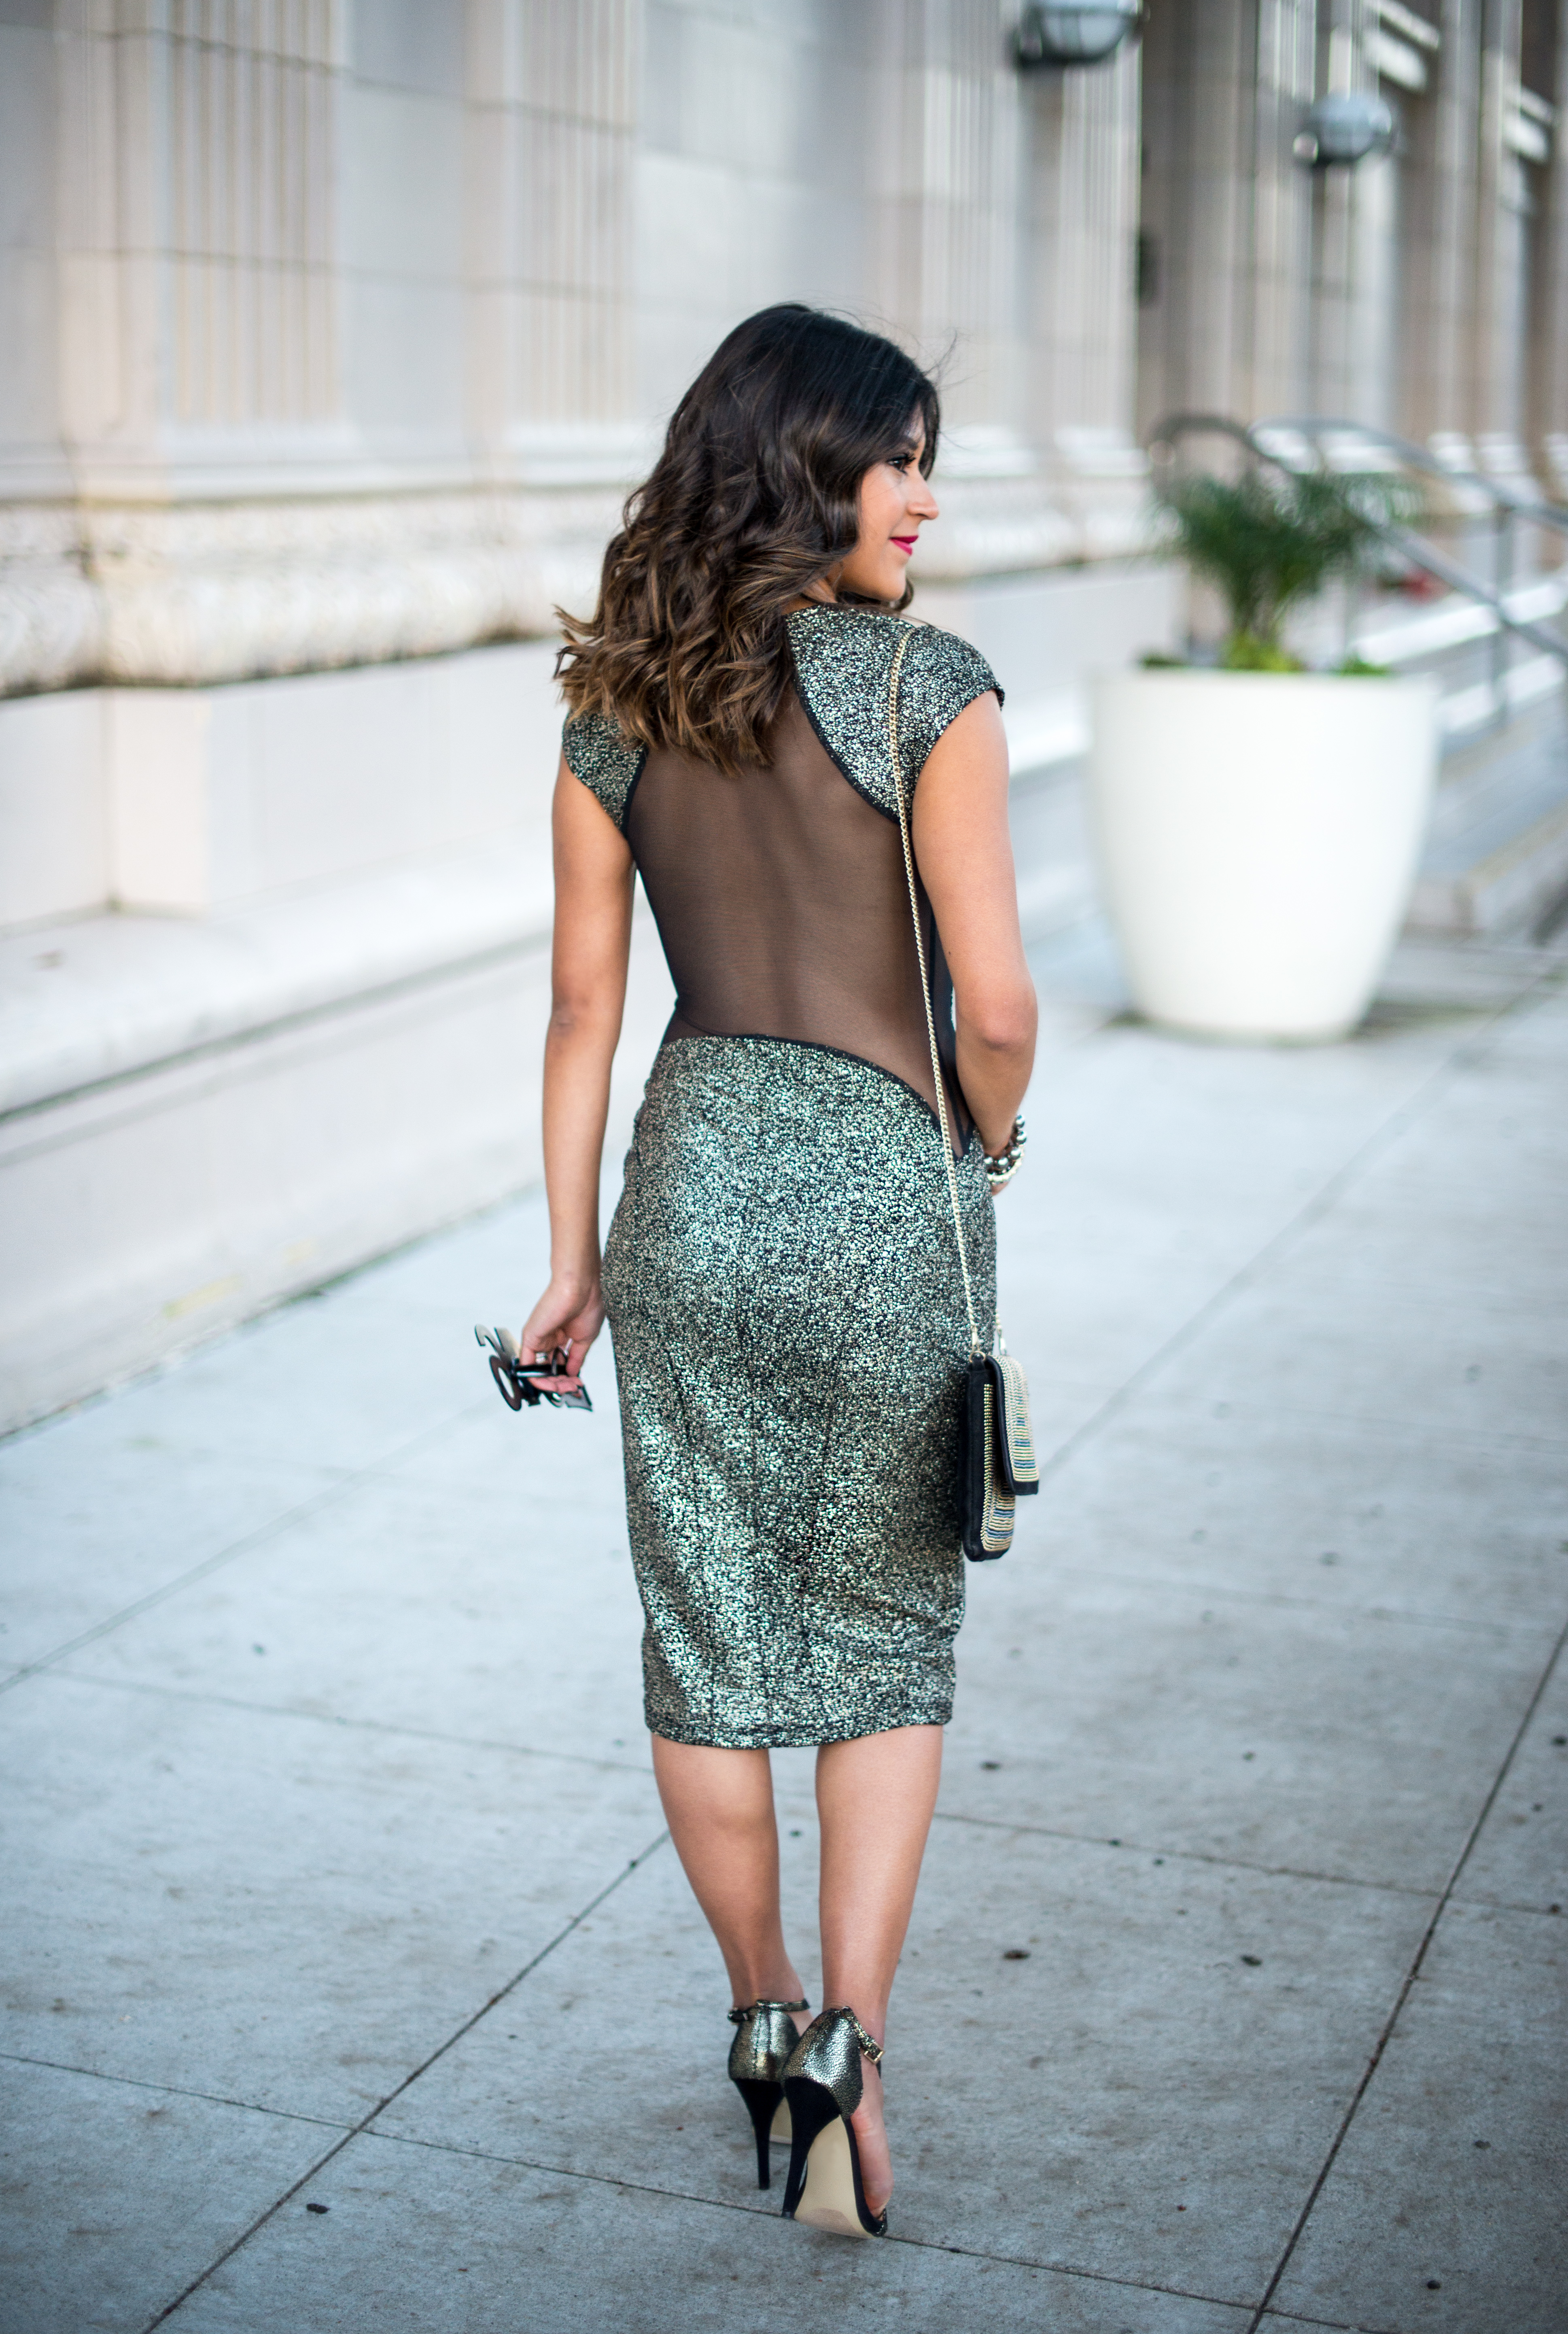 Kelsey Kaplan Fashion - Page 46 of 79 - A San Francisco Lifestyle Blog